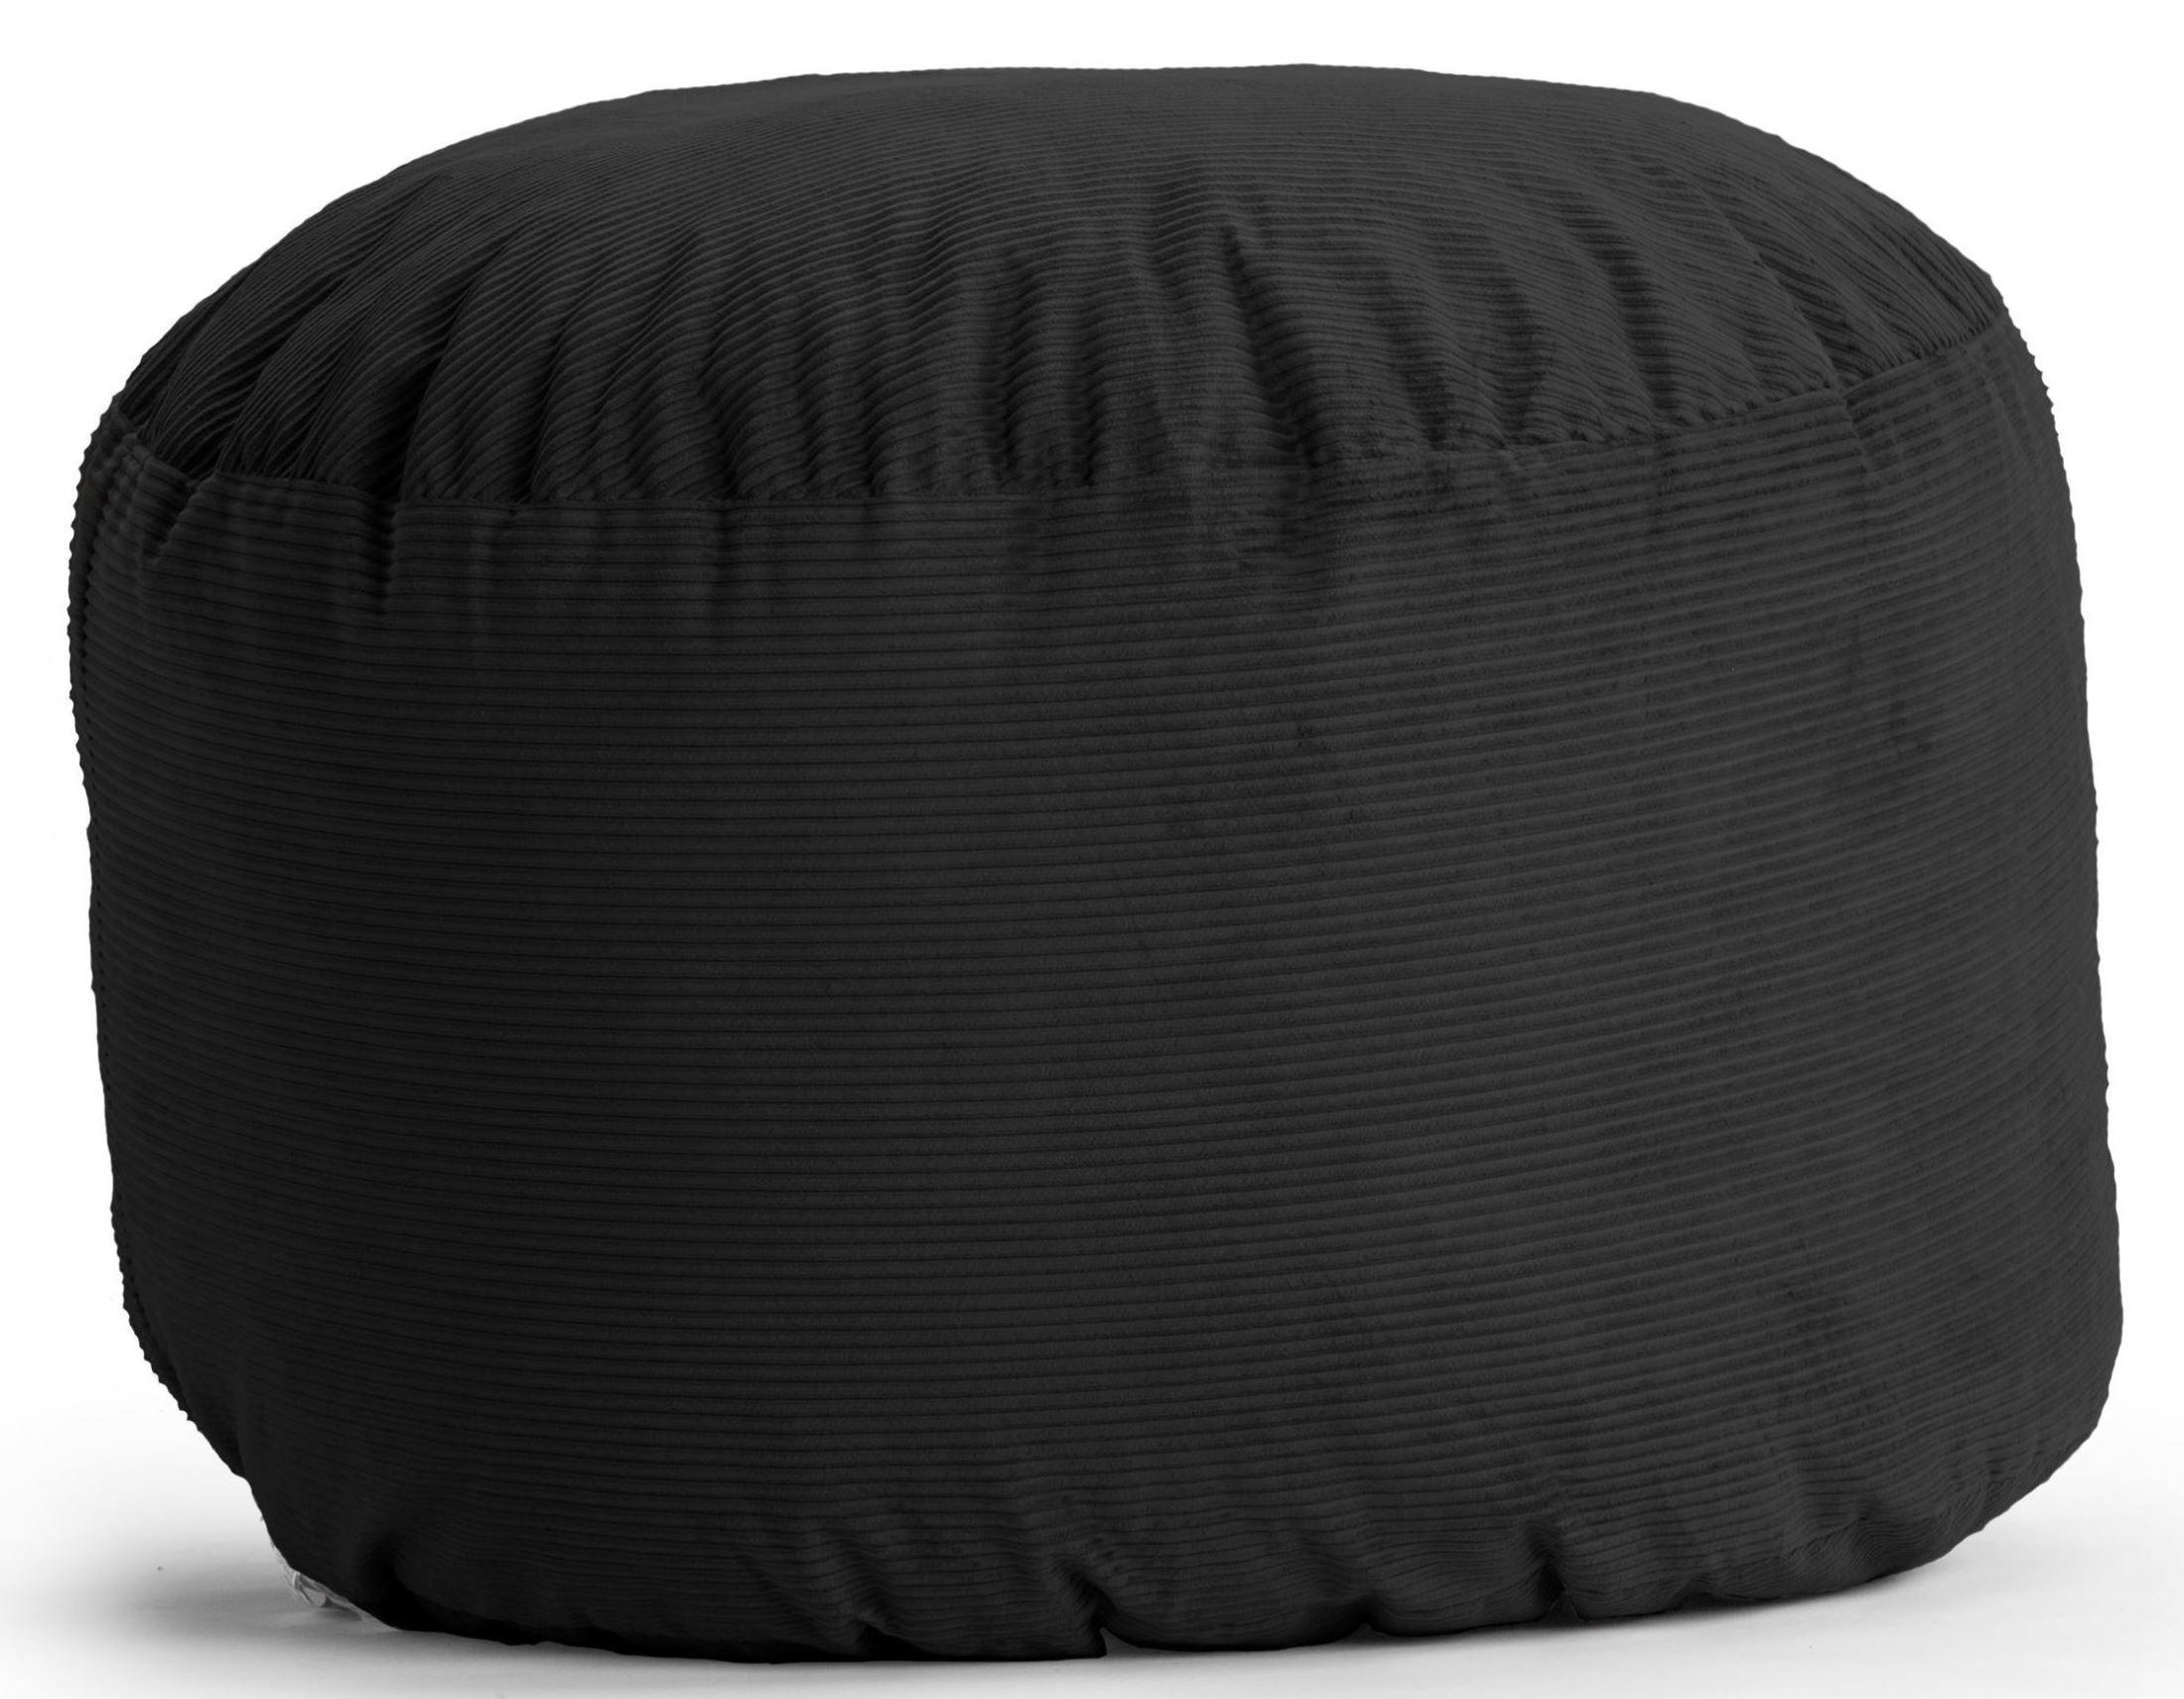 Big Joe King Fuf Black Wide Wale Corduroy Bean Bag From